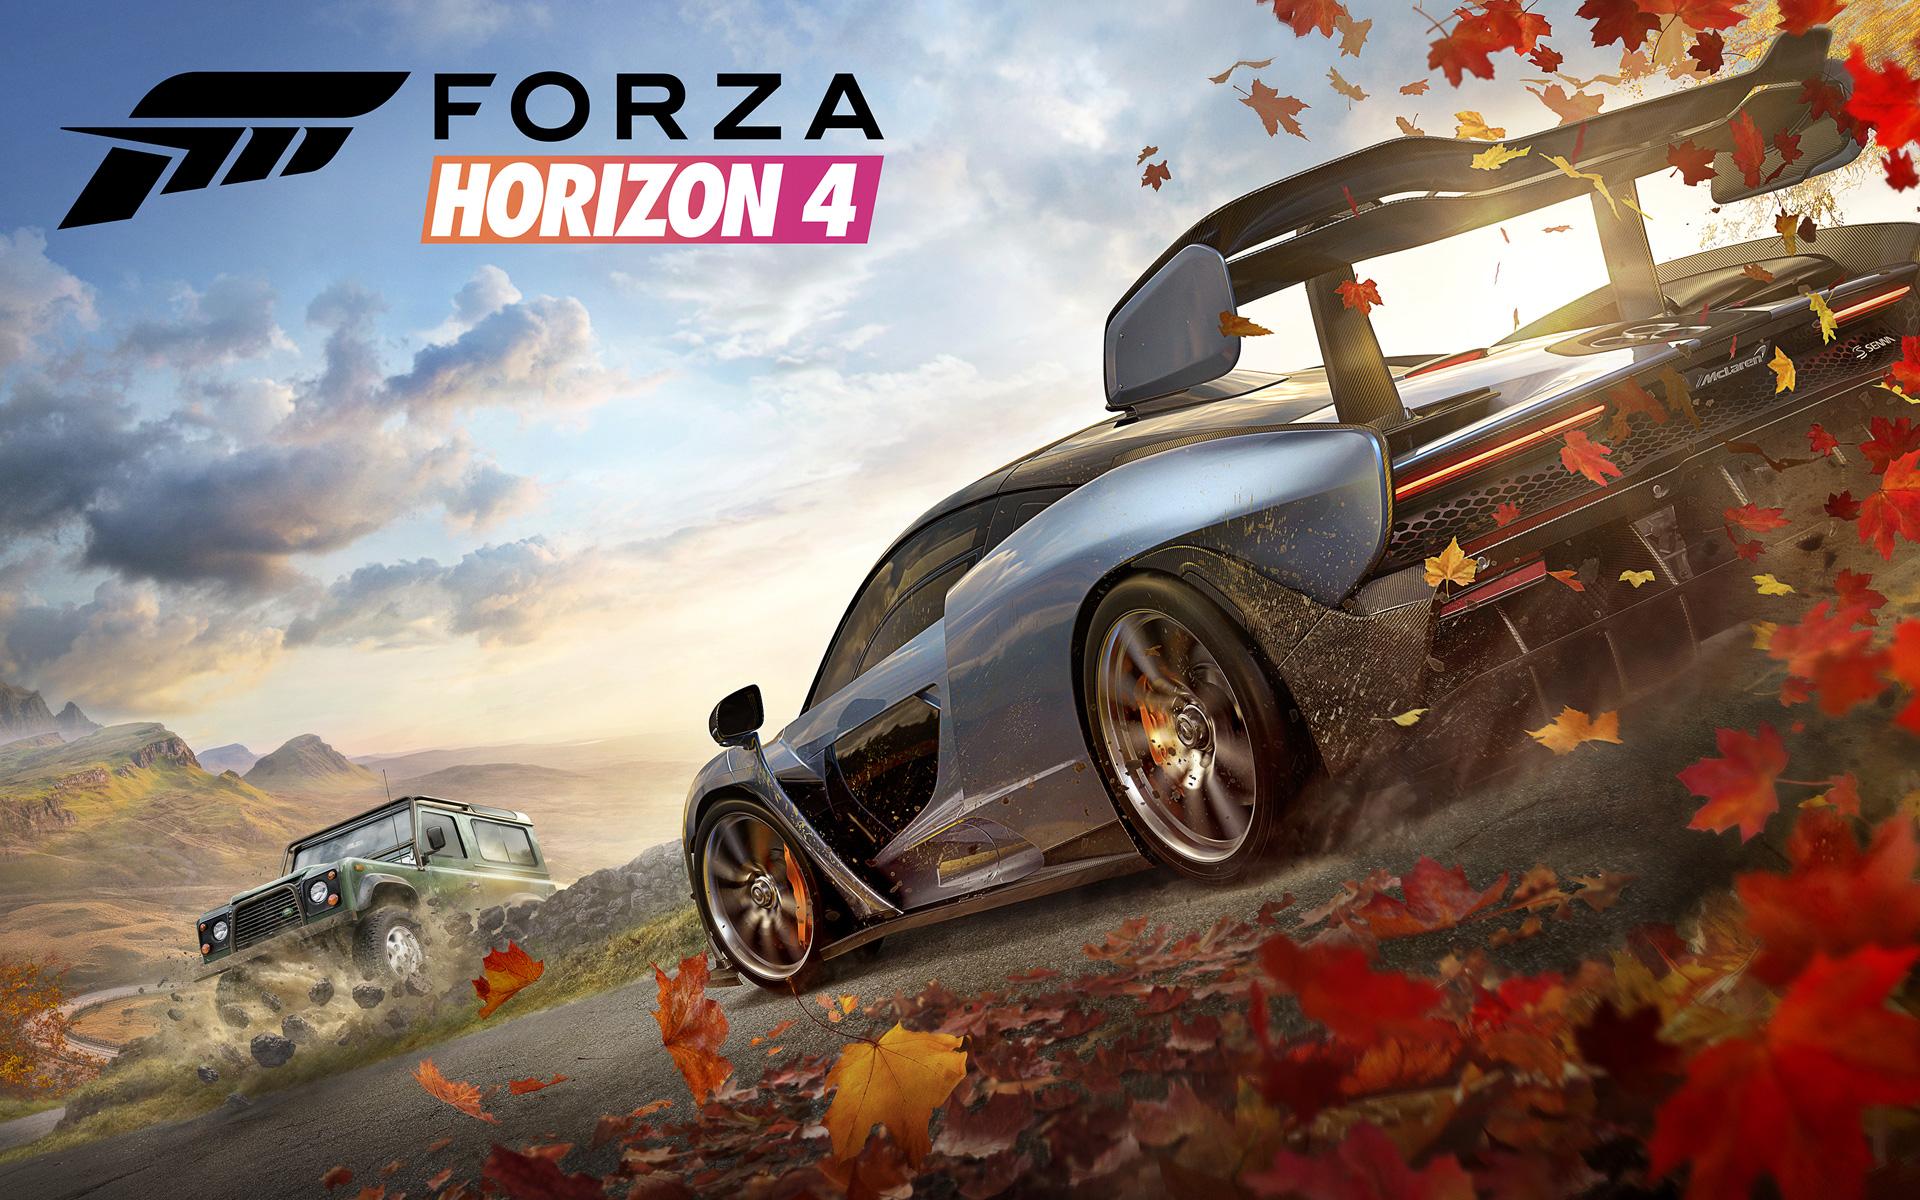 Free Forza Horizon 4 Wallpaper in 1920x1200